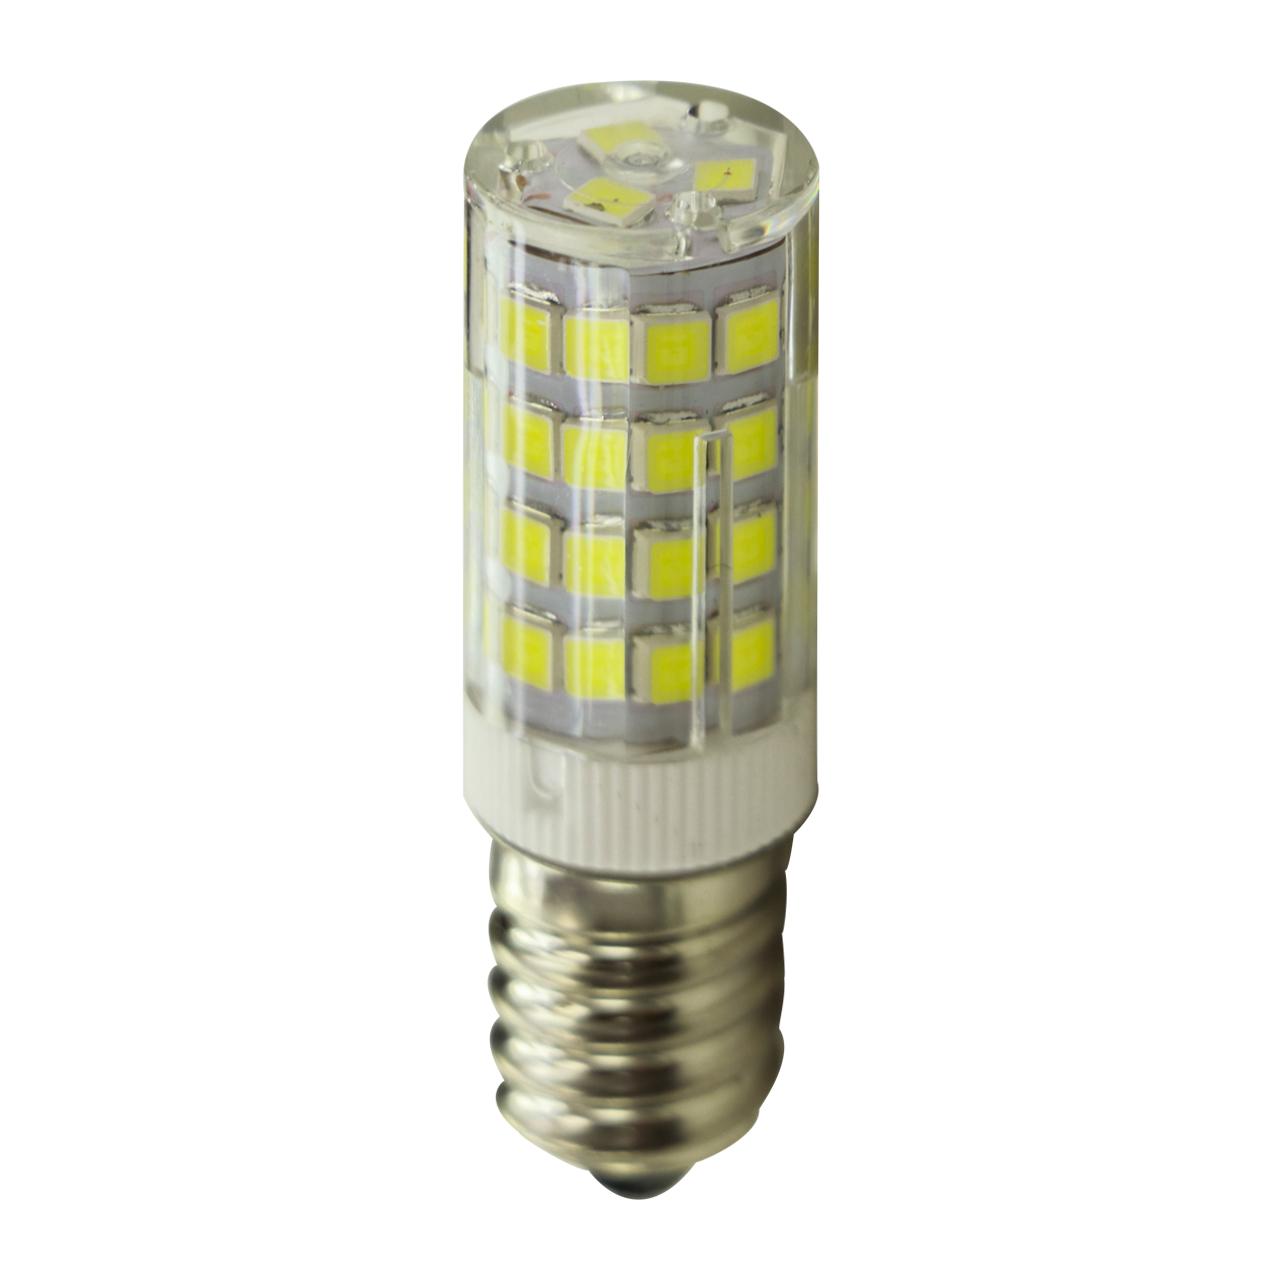 لامپ ال ای دی 5 وات علاالدین کد SMD پایه E14